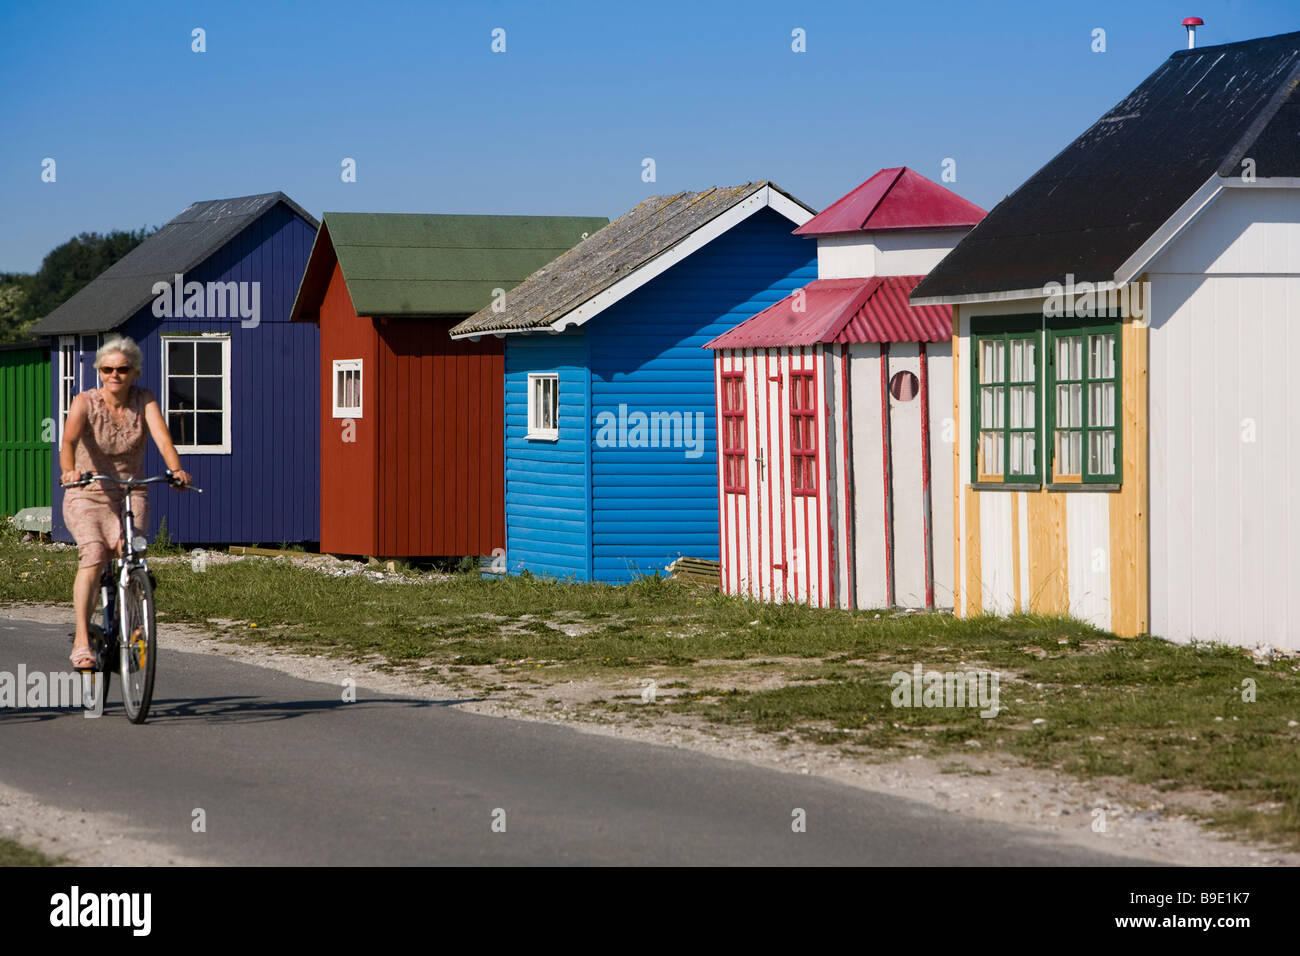 Beach Huts Ærøskøbing Ærø island Funen Denmark - Stock Image